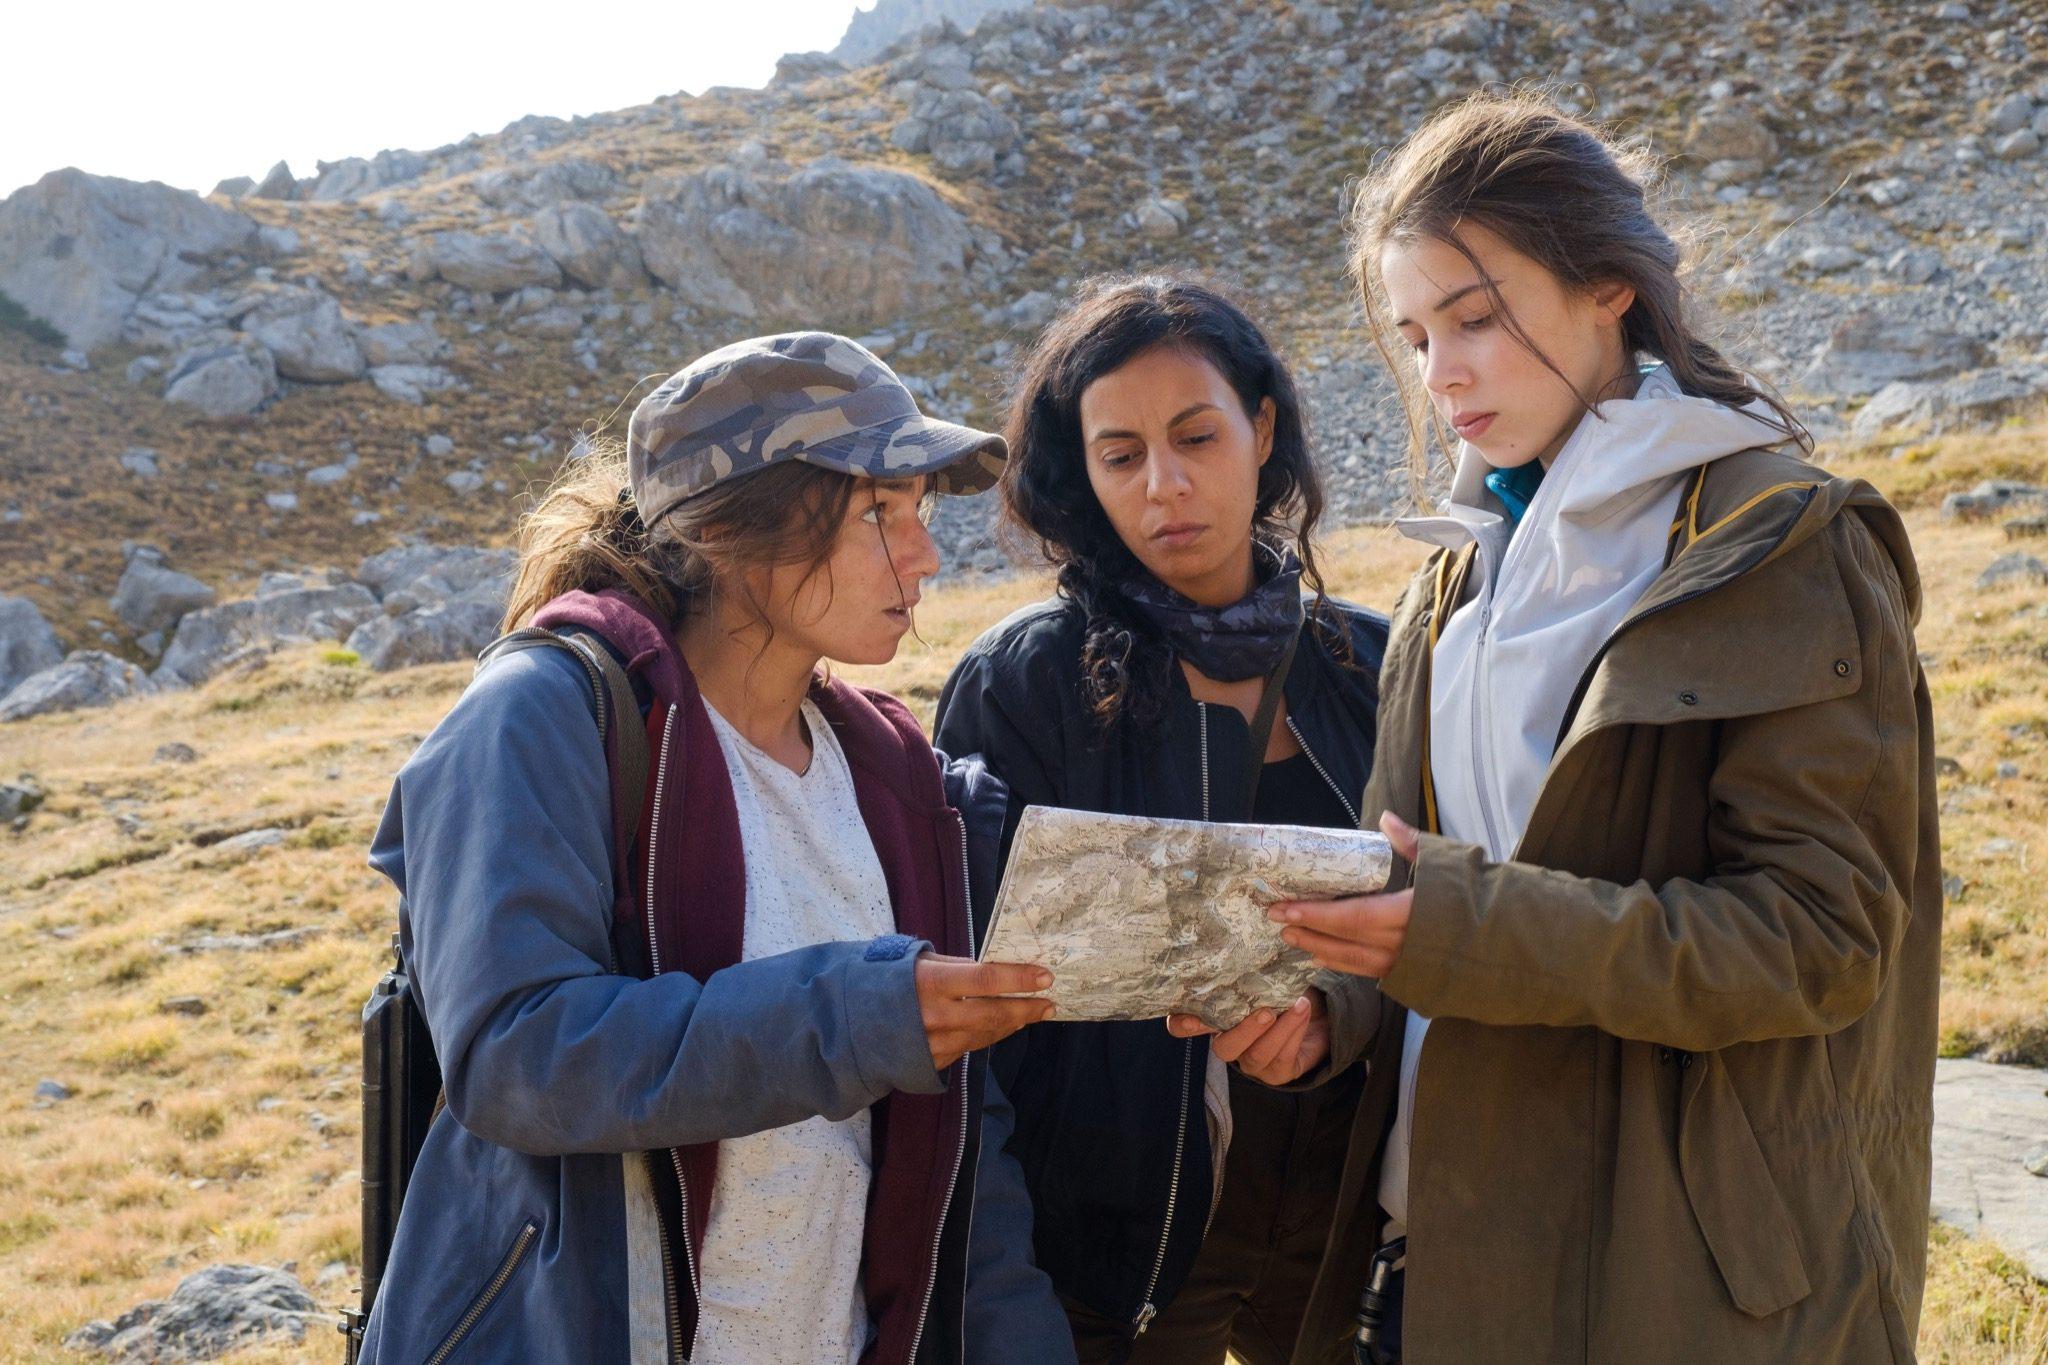 Charlotte Bartocci, Nina Mazodier, and Leyla Jawad in Alex Hugo (2014)